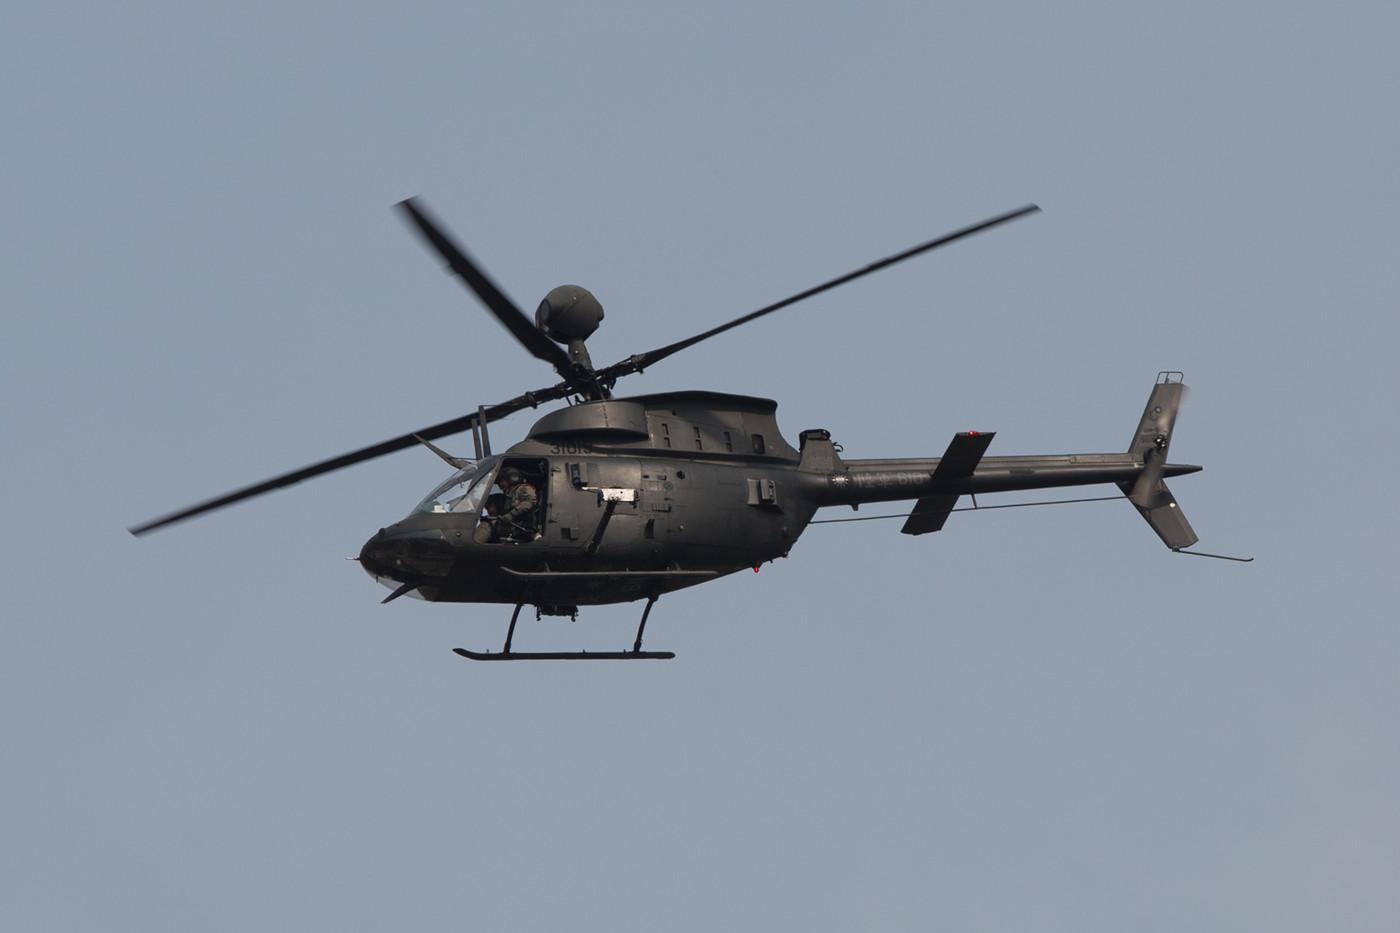 Bell OH-58 Kiowa der Army.